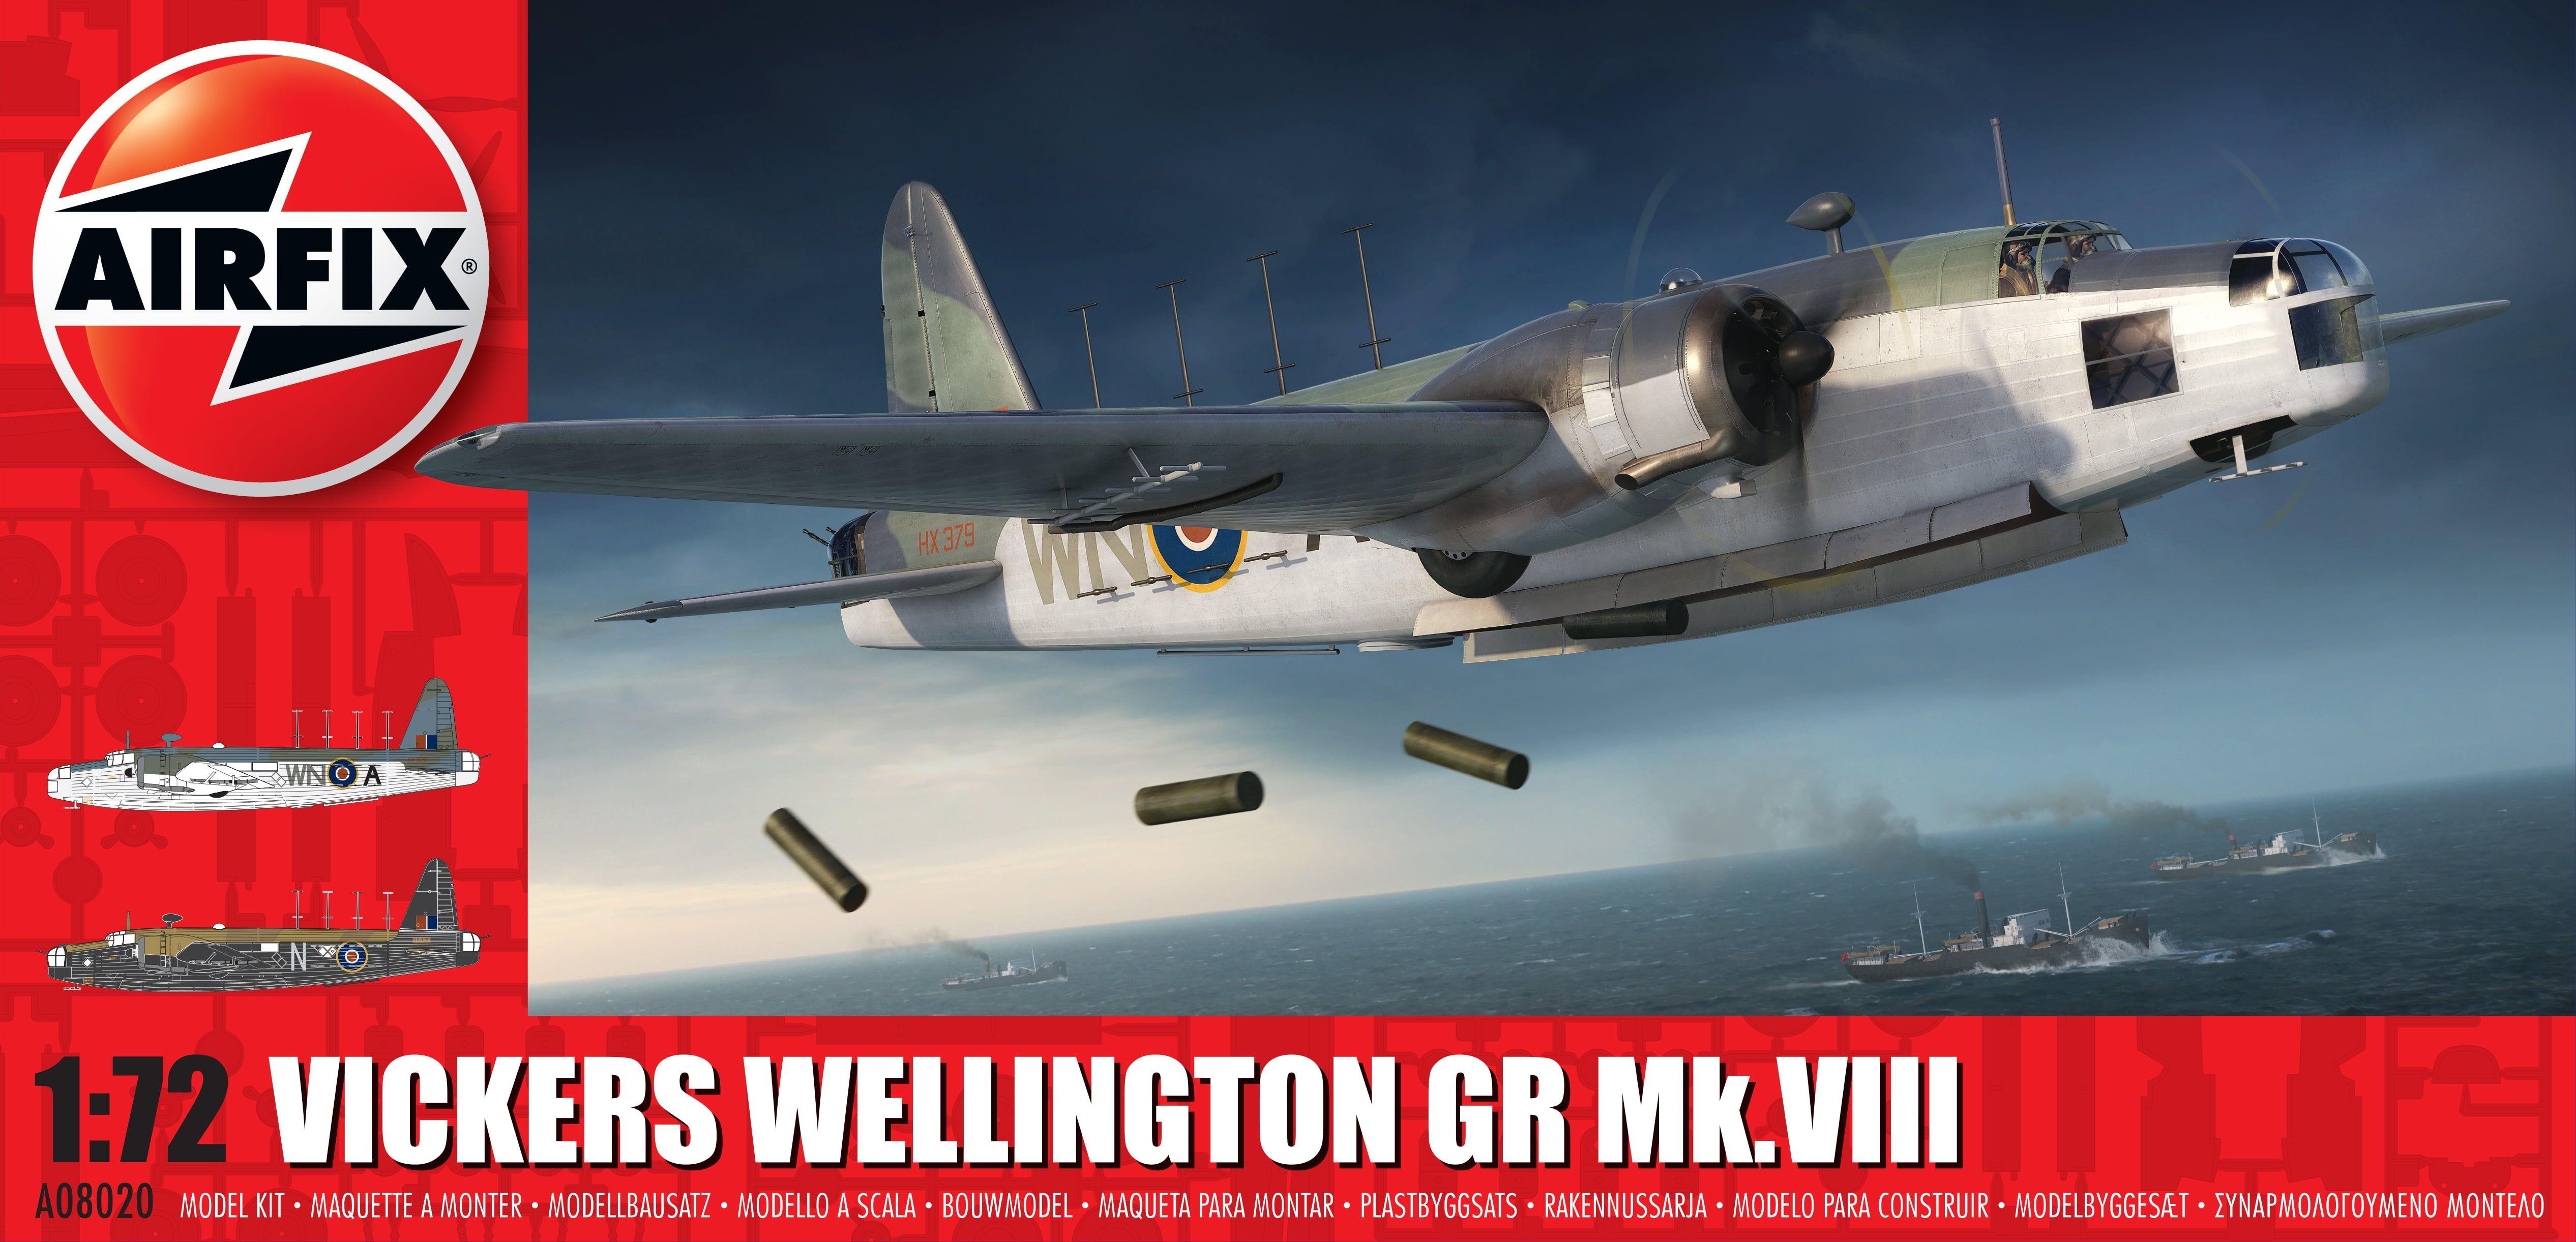 Airfix Vickers Wellington Mk.VIII 1:72 Scale Plastic Model Kit